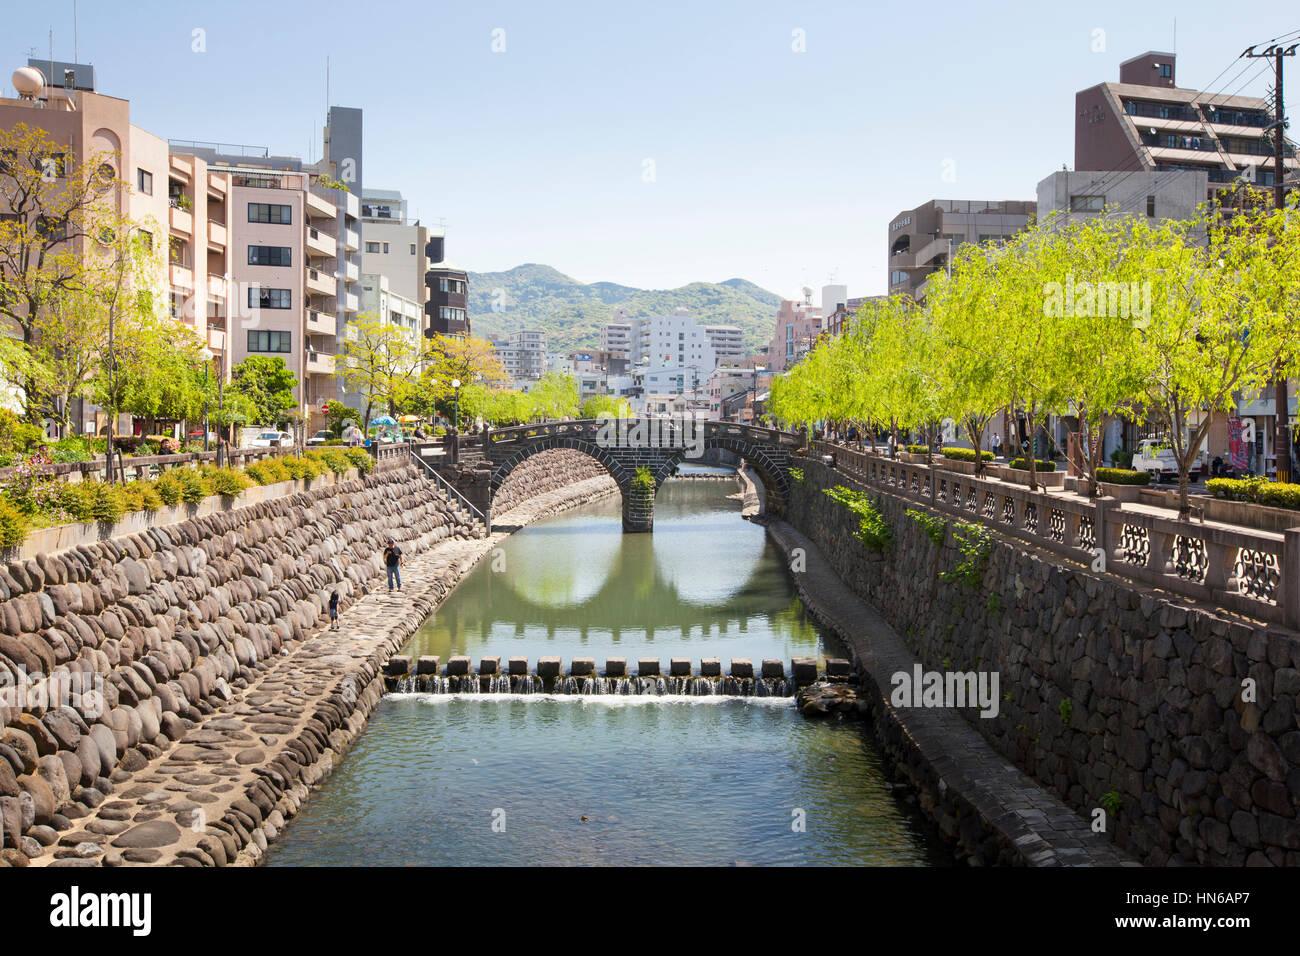 NAGASAKI, JAPAN - April 28 : The Nakashima river and Spectacles Bridge in Nagasaki, Japan on 28th April 2012. The - Stock Image